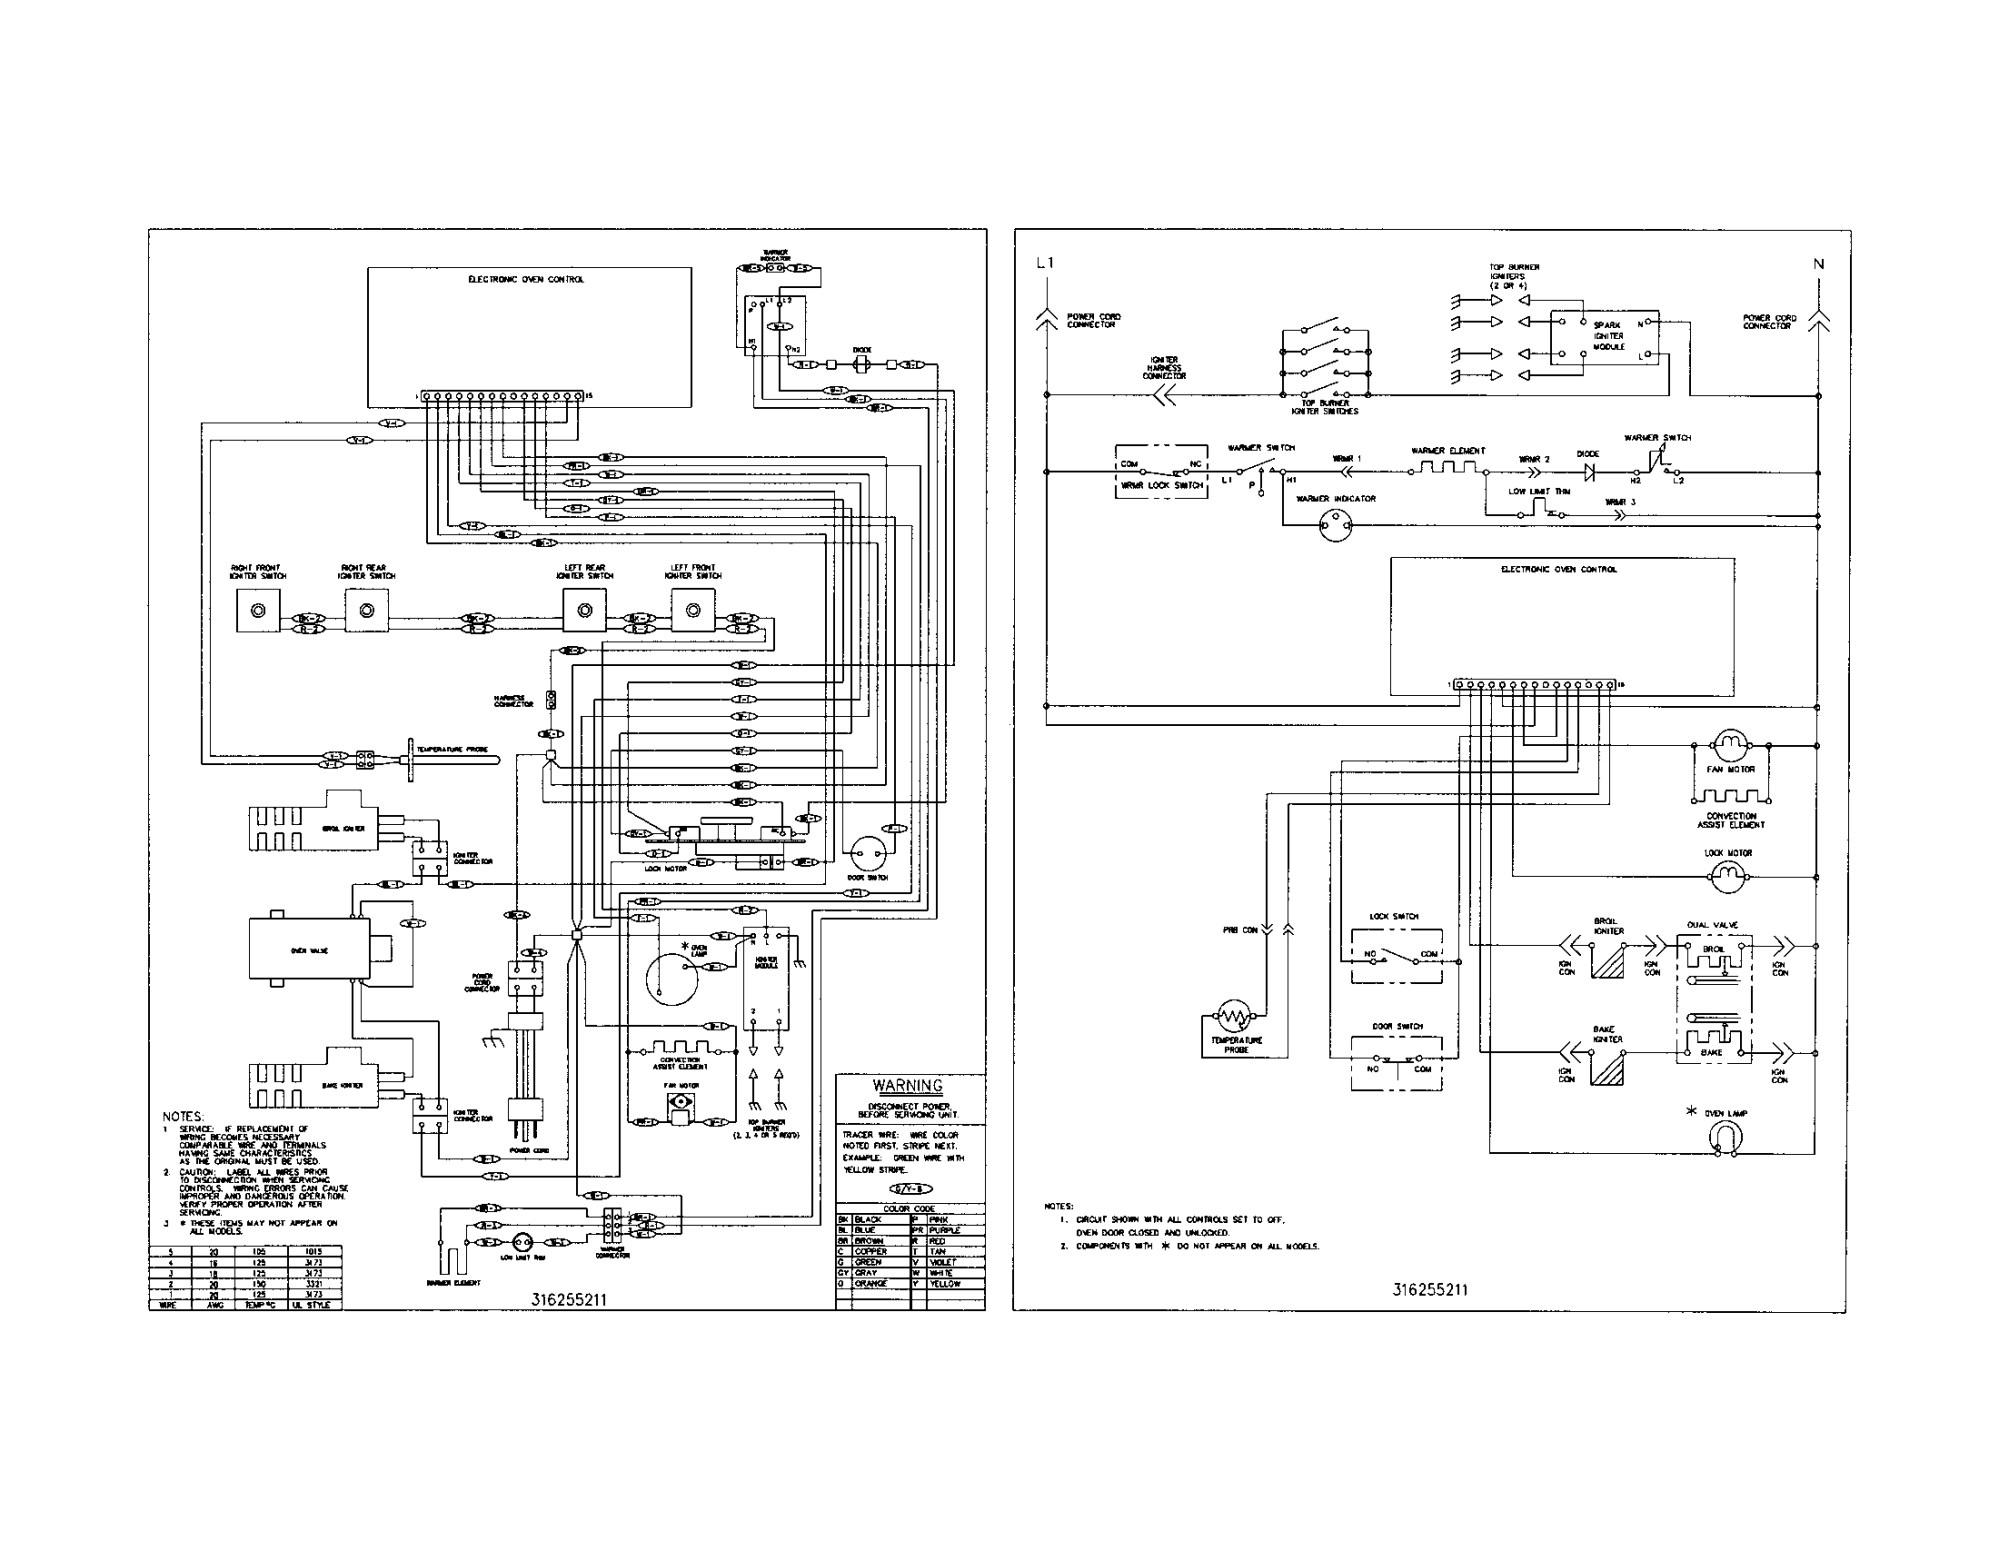 hight resolution of whirlpool gas dryer wiring diagram frigidaire dryer wiring diagram luxury amazing free sample ideas frigidaire